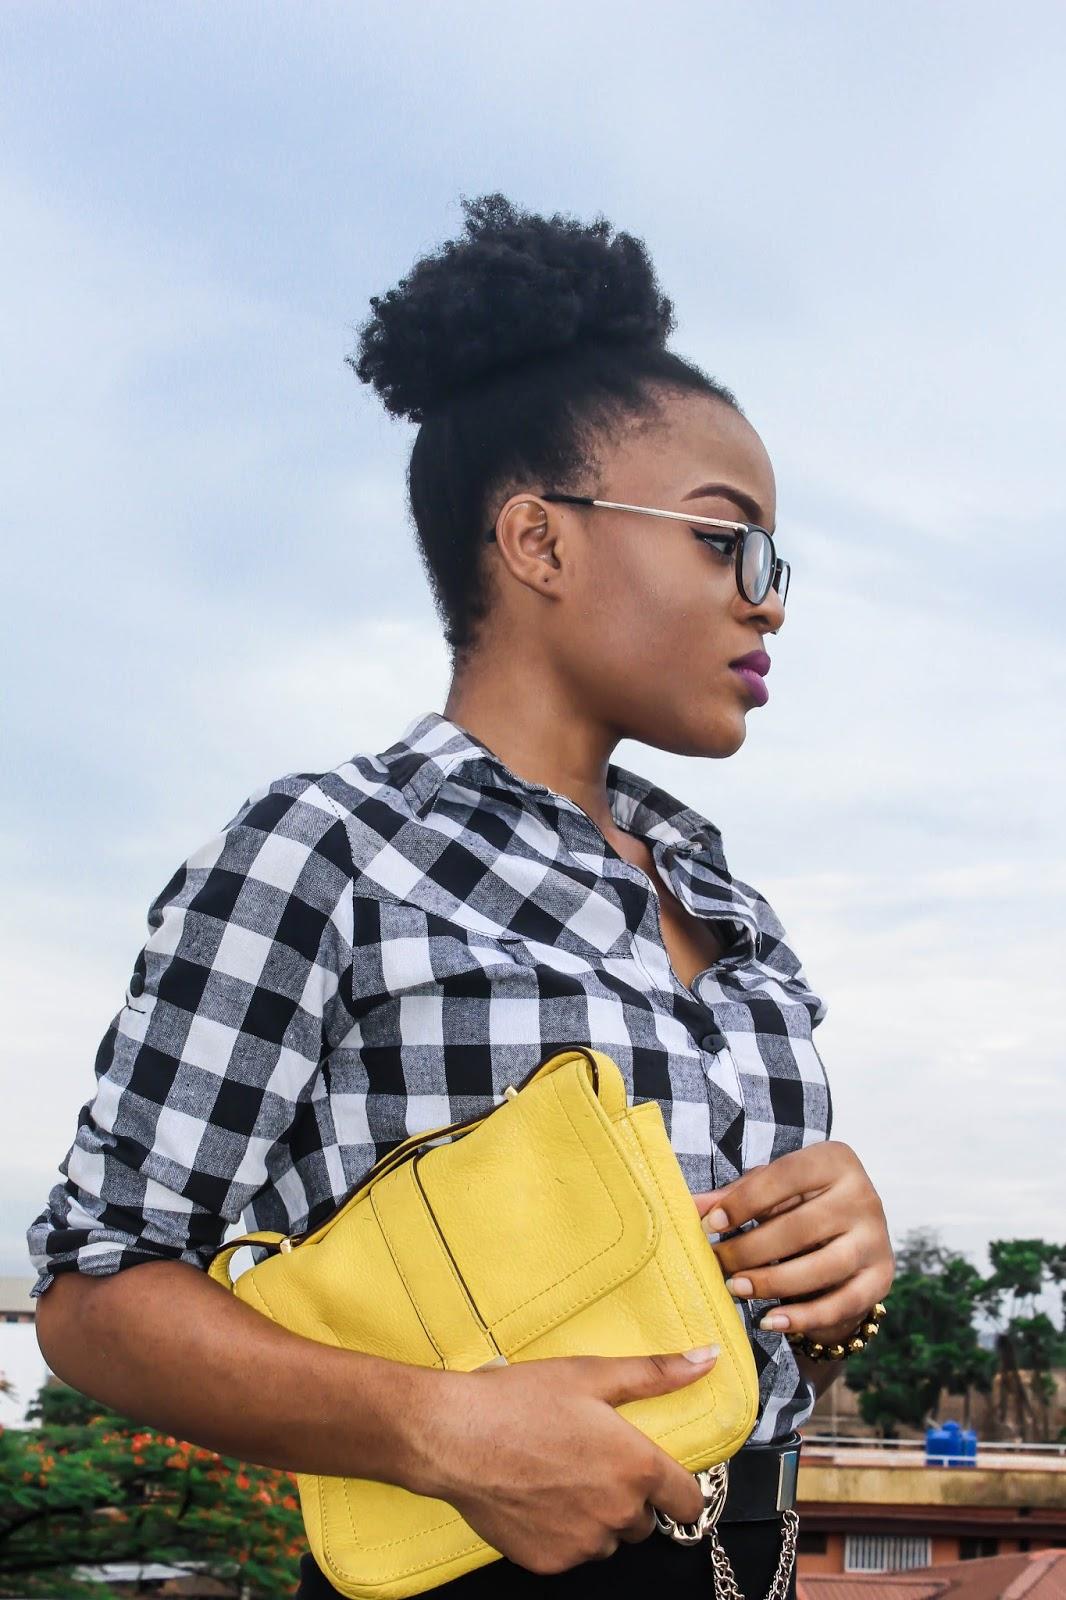 oncedarplanet, natural hair shrinkage, yellow saddle bag